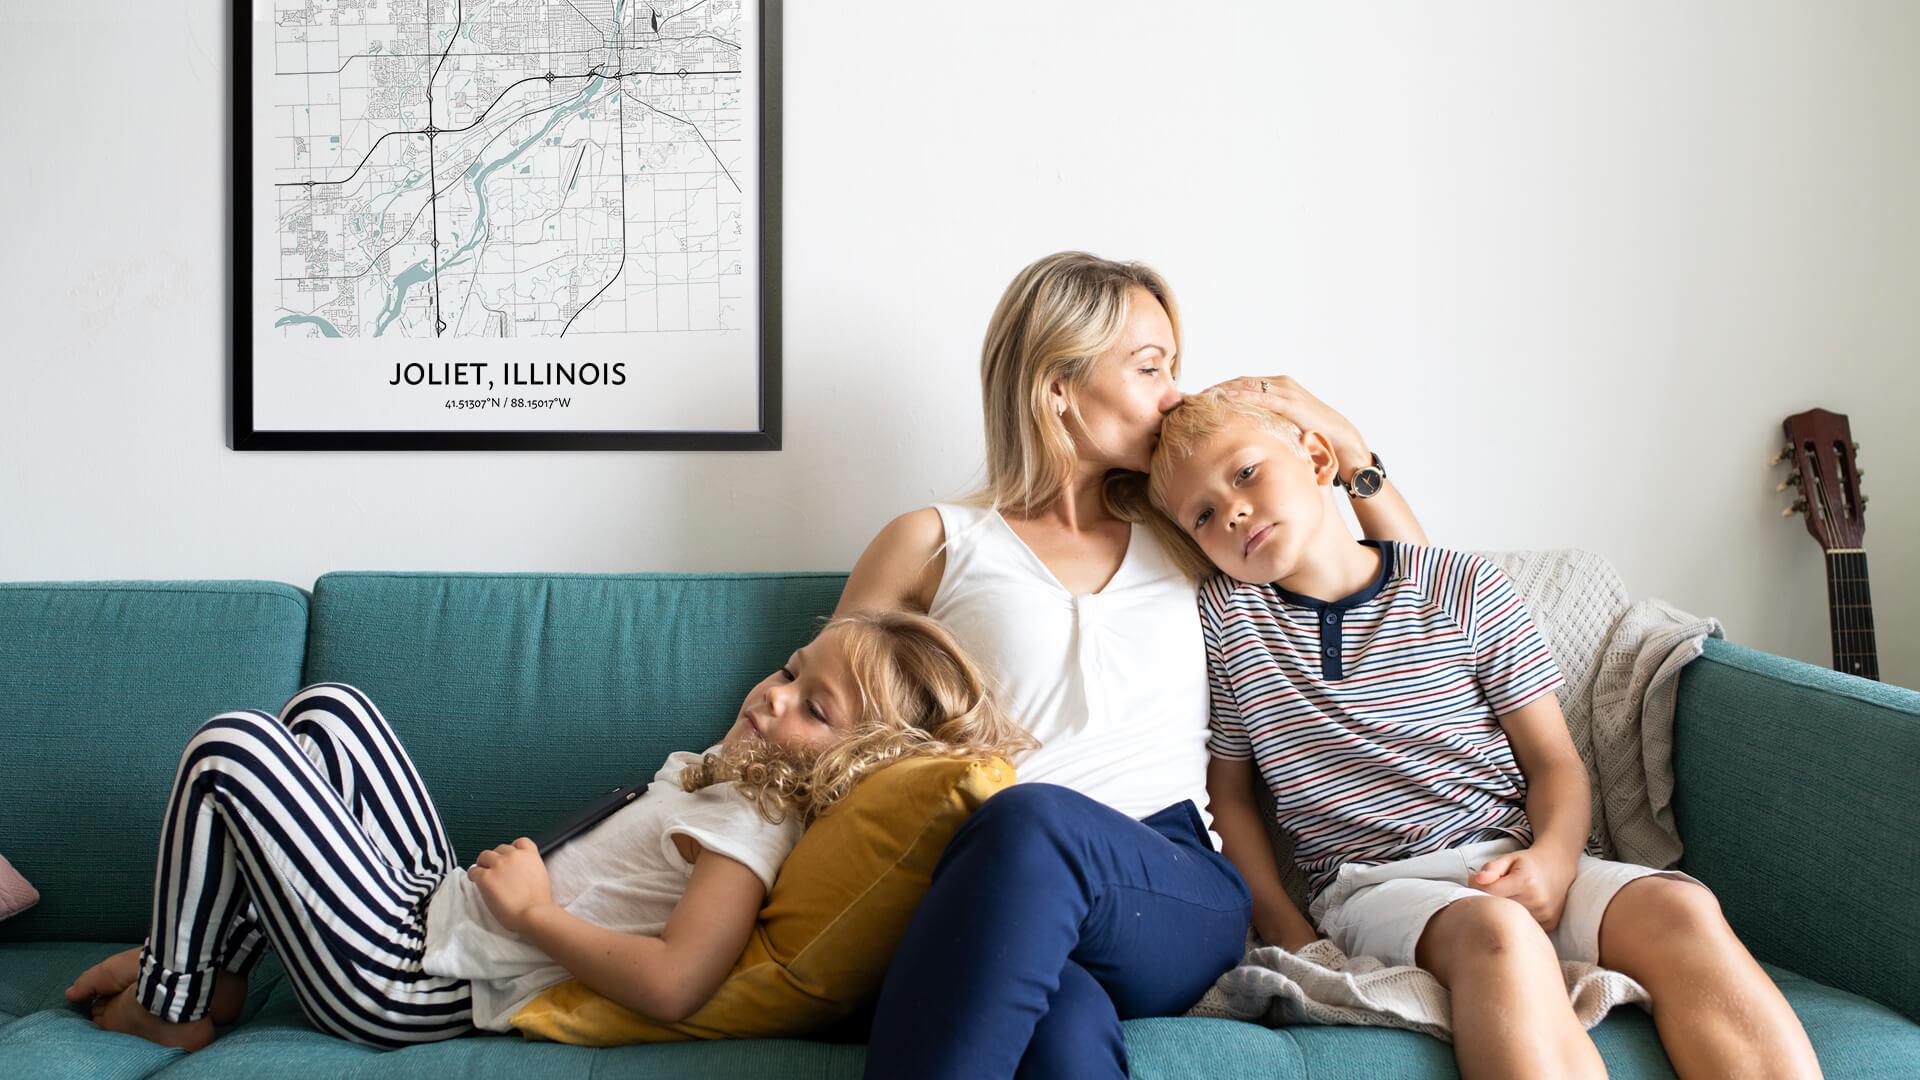 Joliet map poster